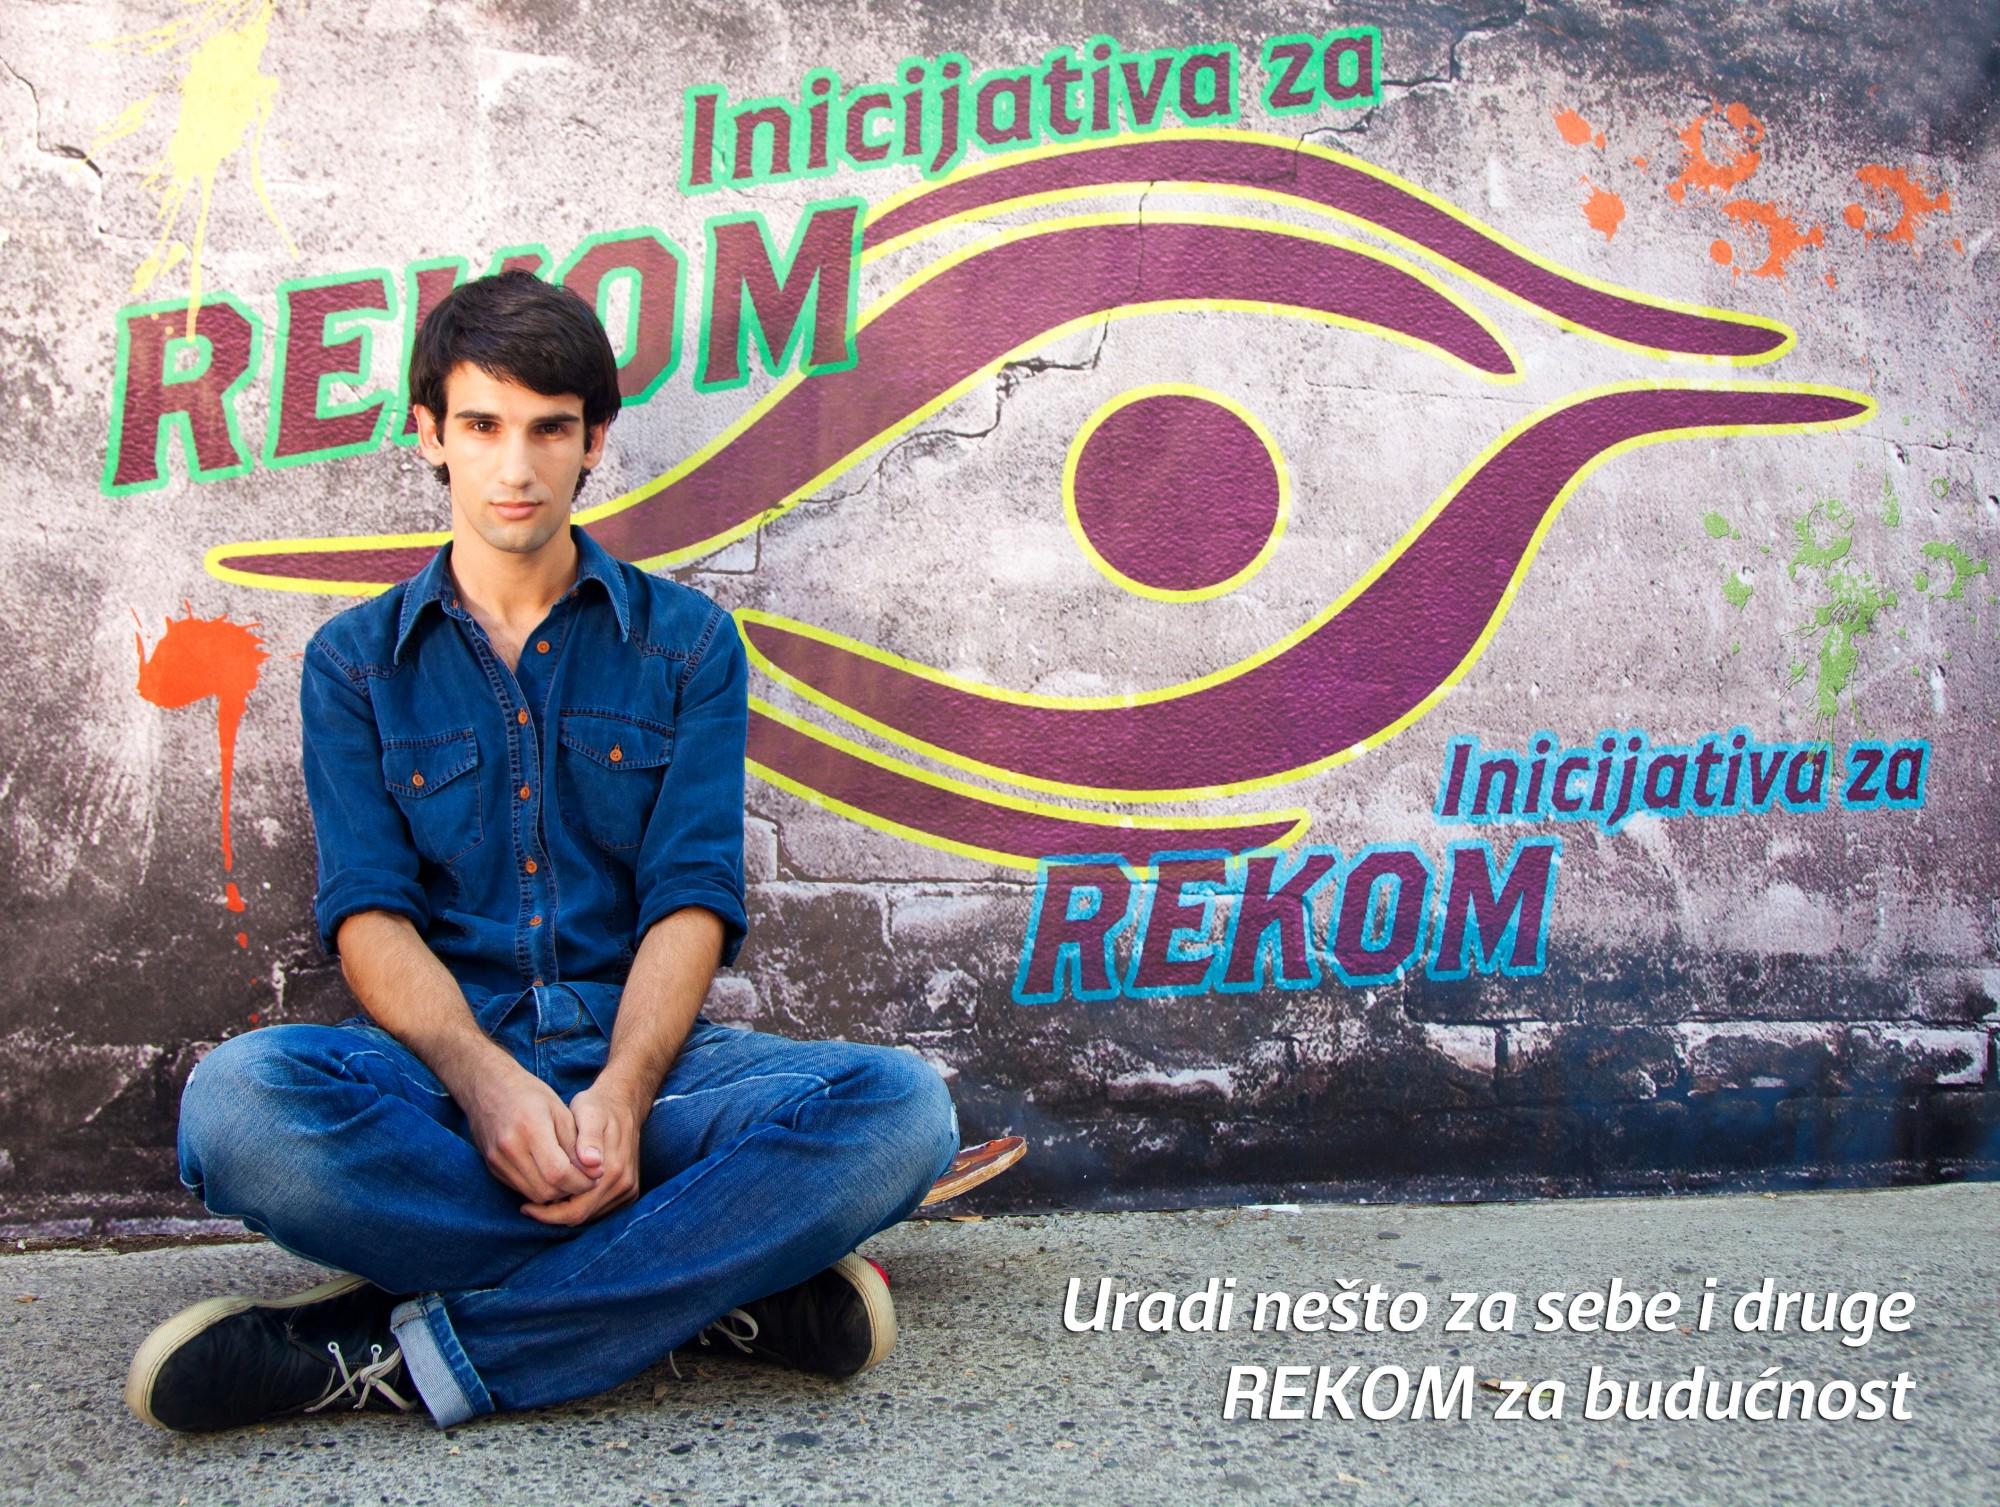 Ivo Josipović urges Kolinda Grabar Kitarović be involved in the Initiative for RECOM